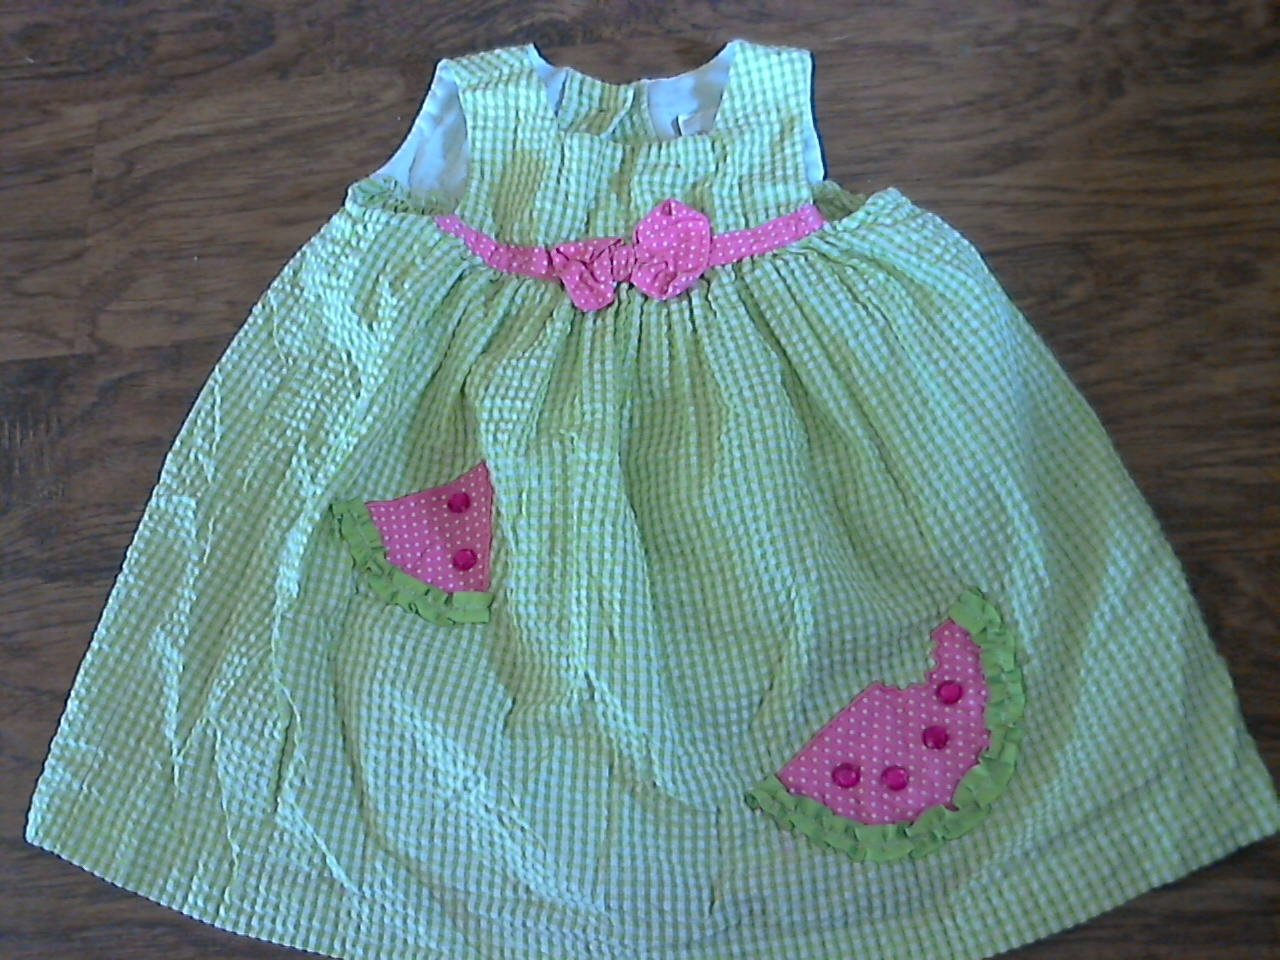 Toddler girl's green and white plaids sleeveless dress 2T